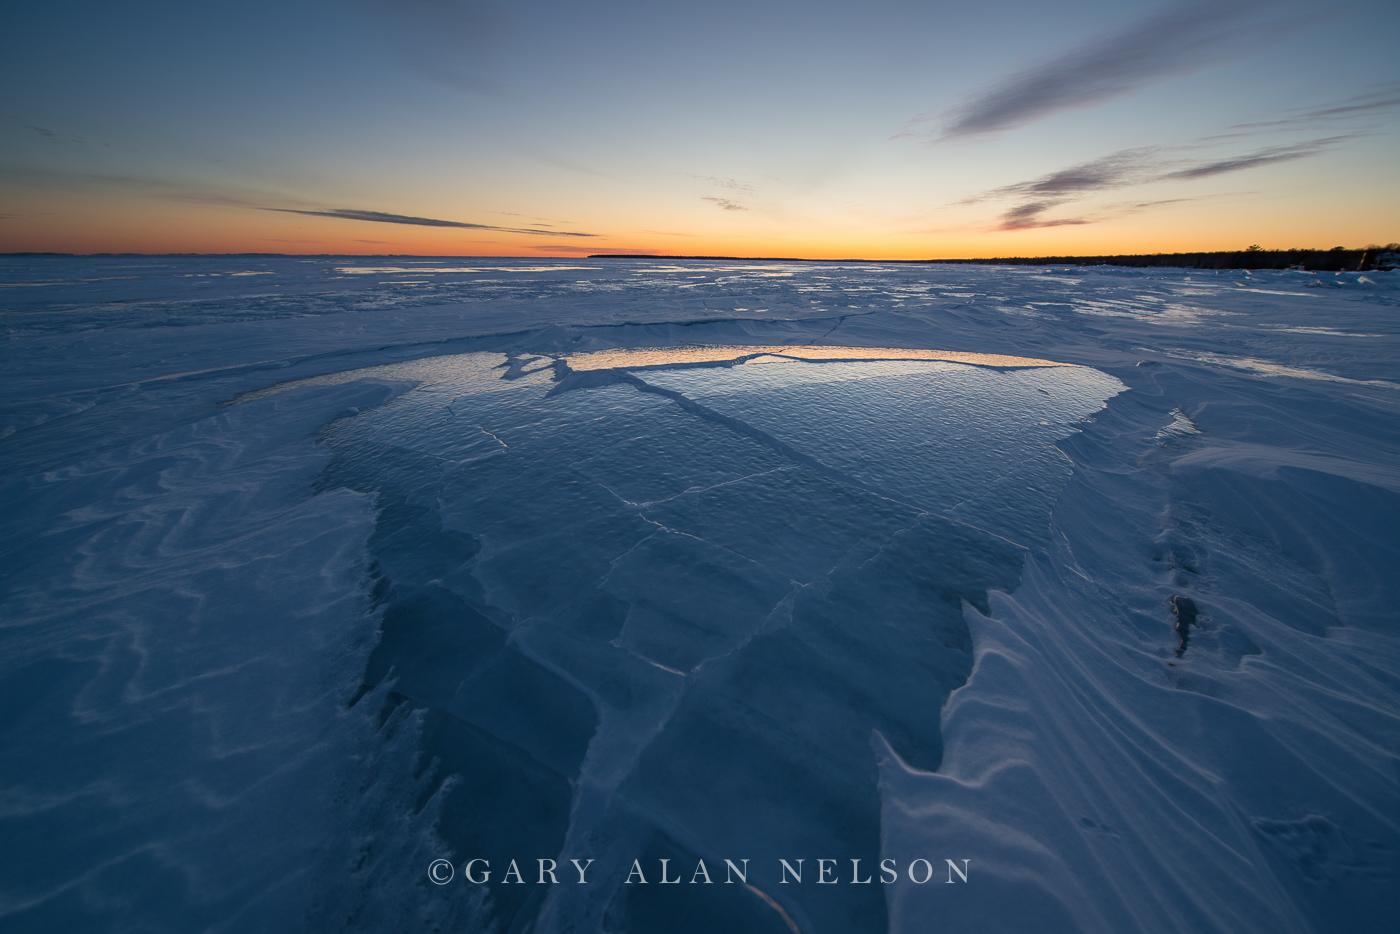 Fractured Ice on Lake Superior, Madeline Island, Apostle Islands National Lakeshore, Wisconsin